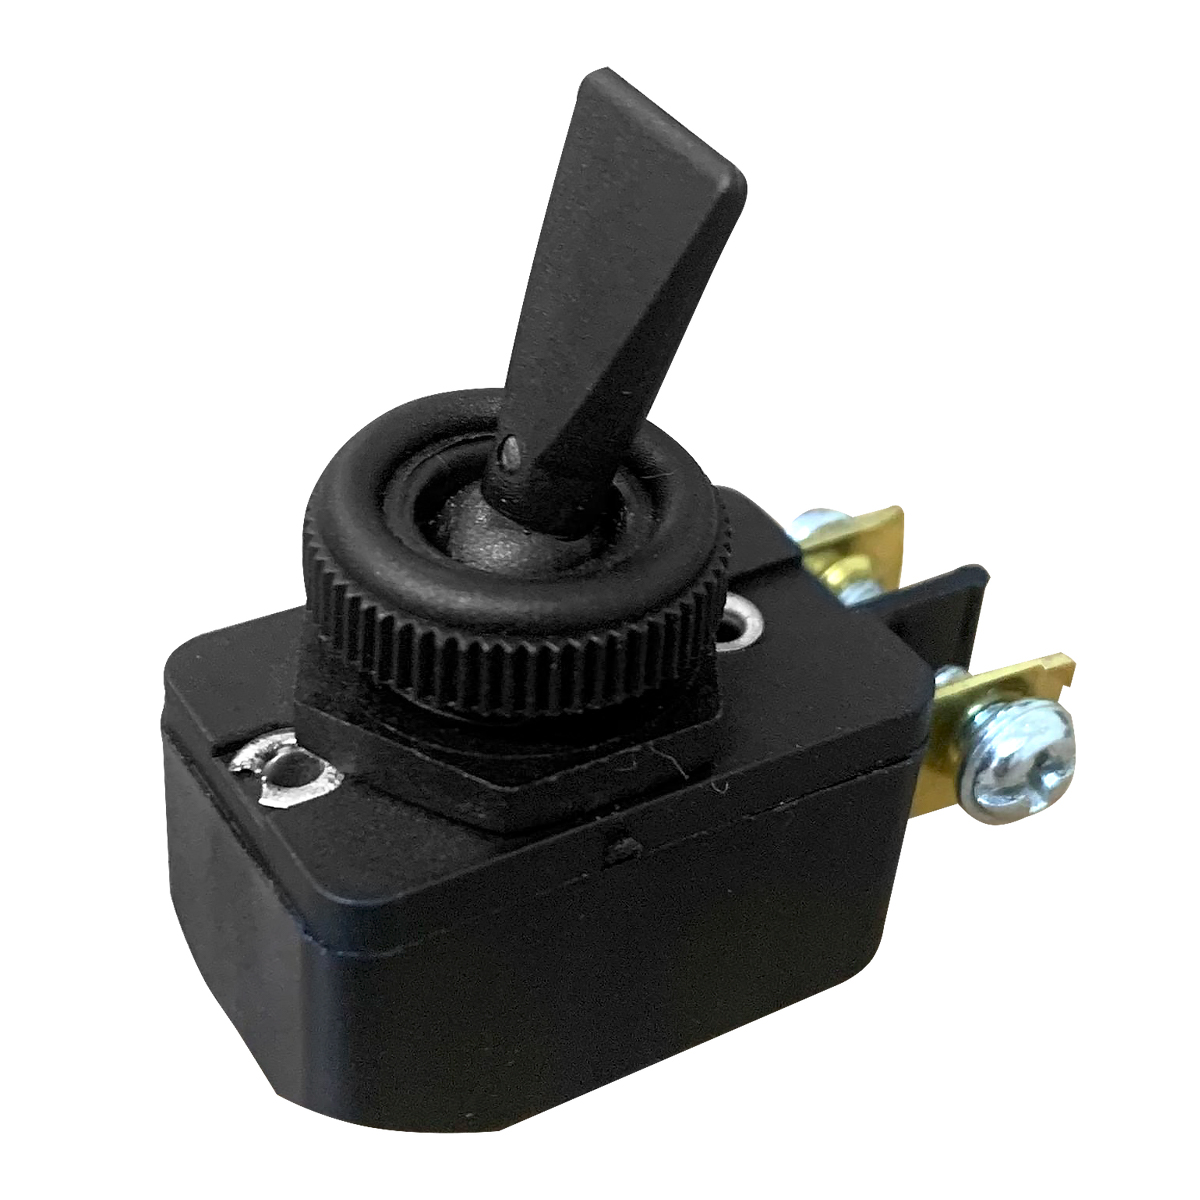 Chave Interruptor Margirius Cs301-d Plástico Alavanca Tic Tac